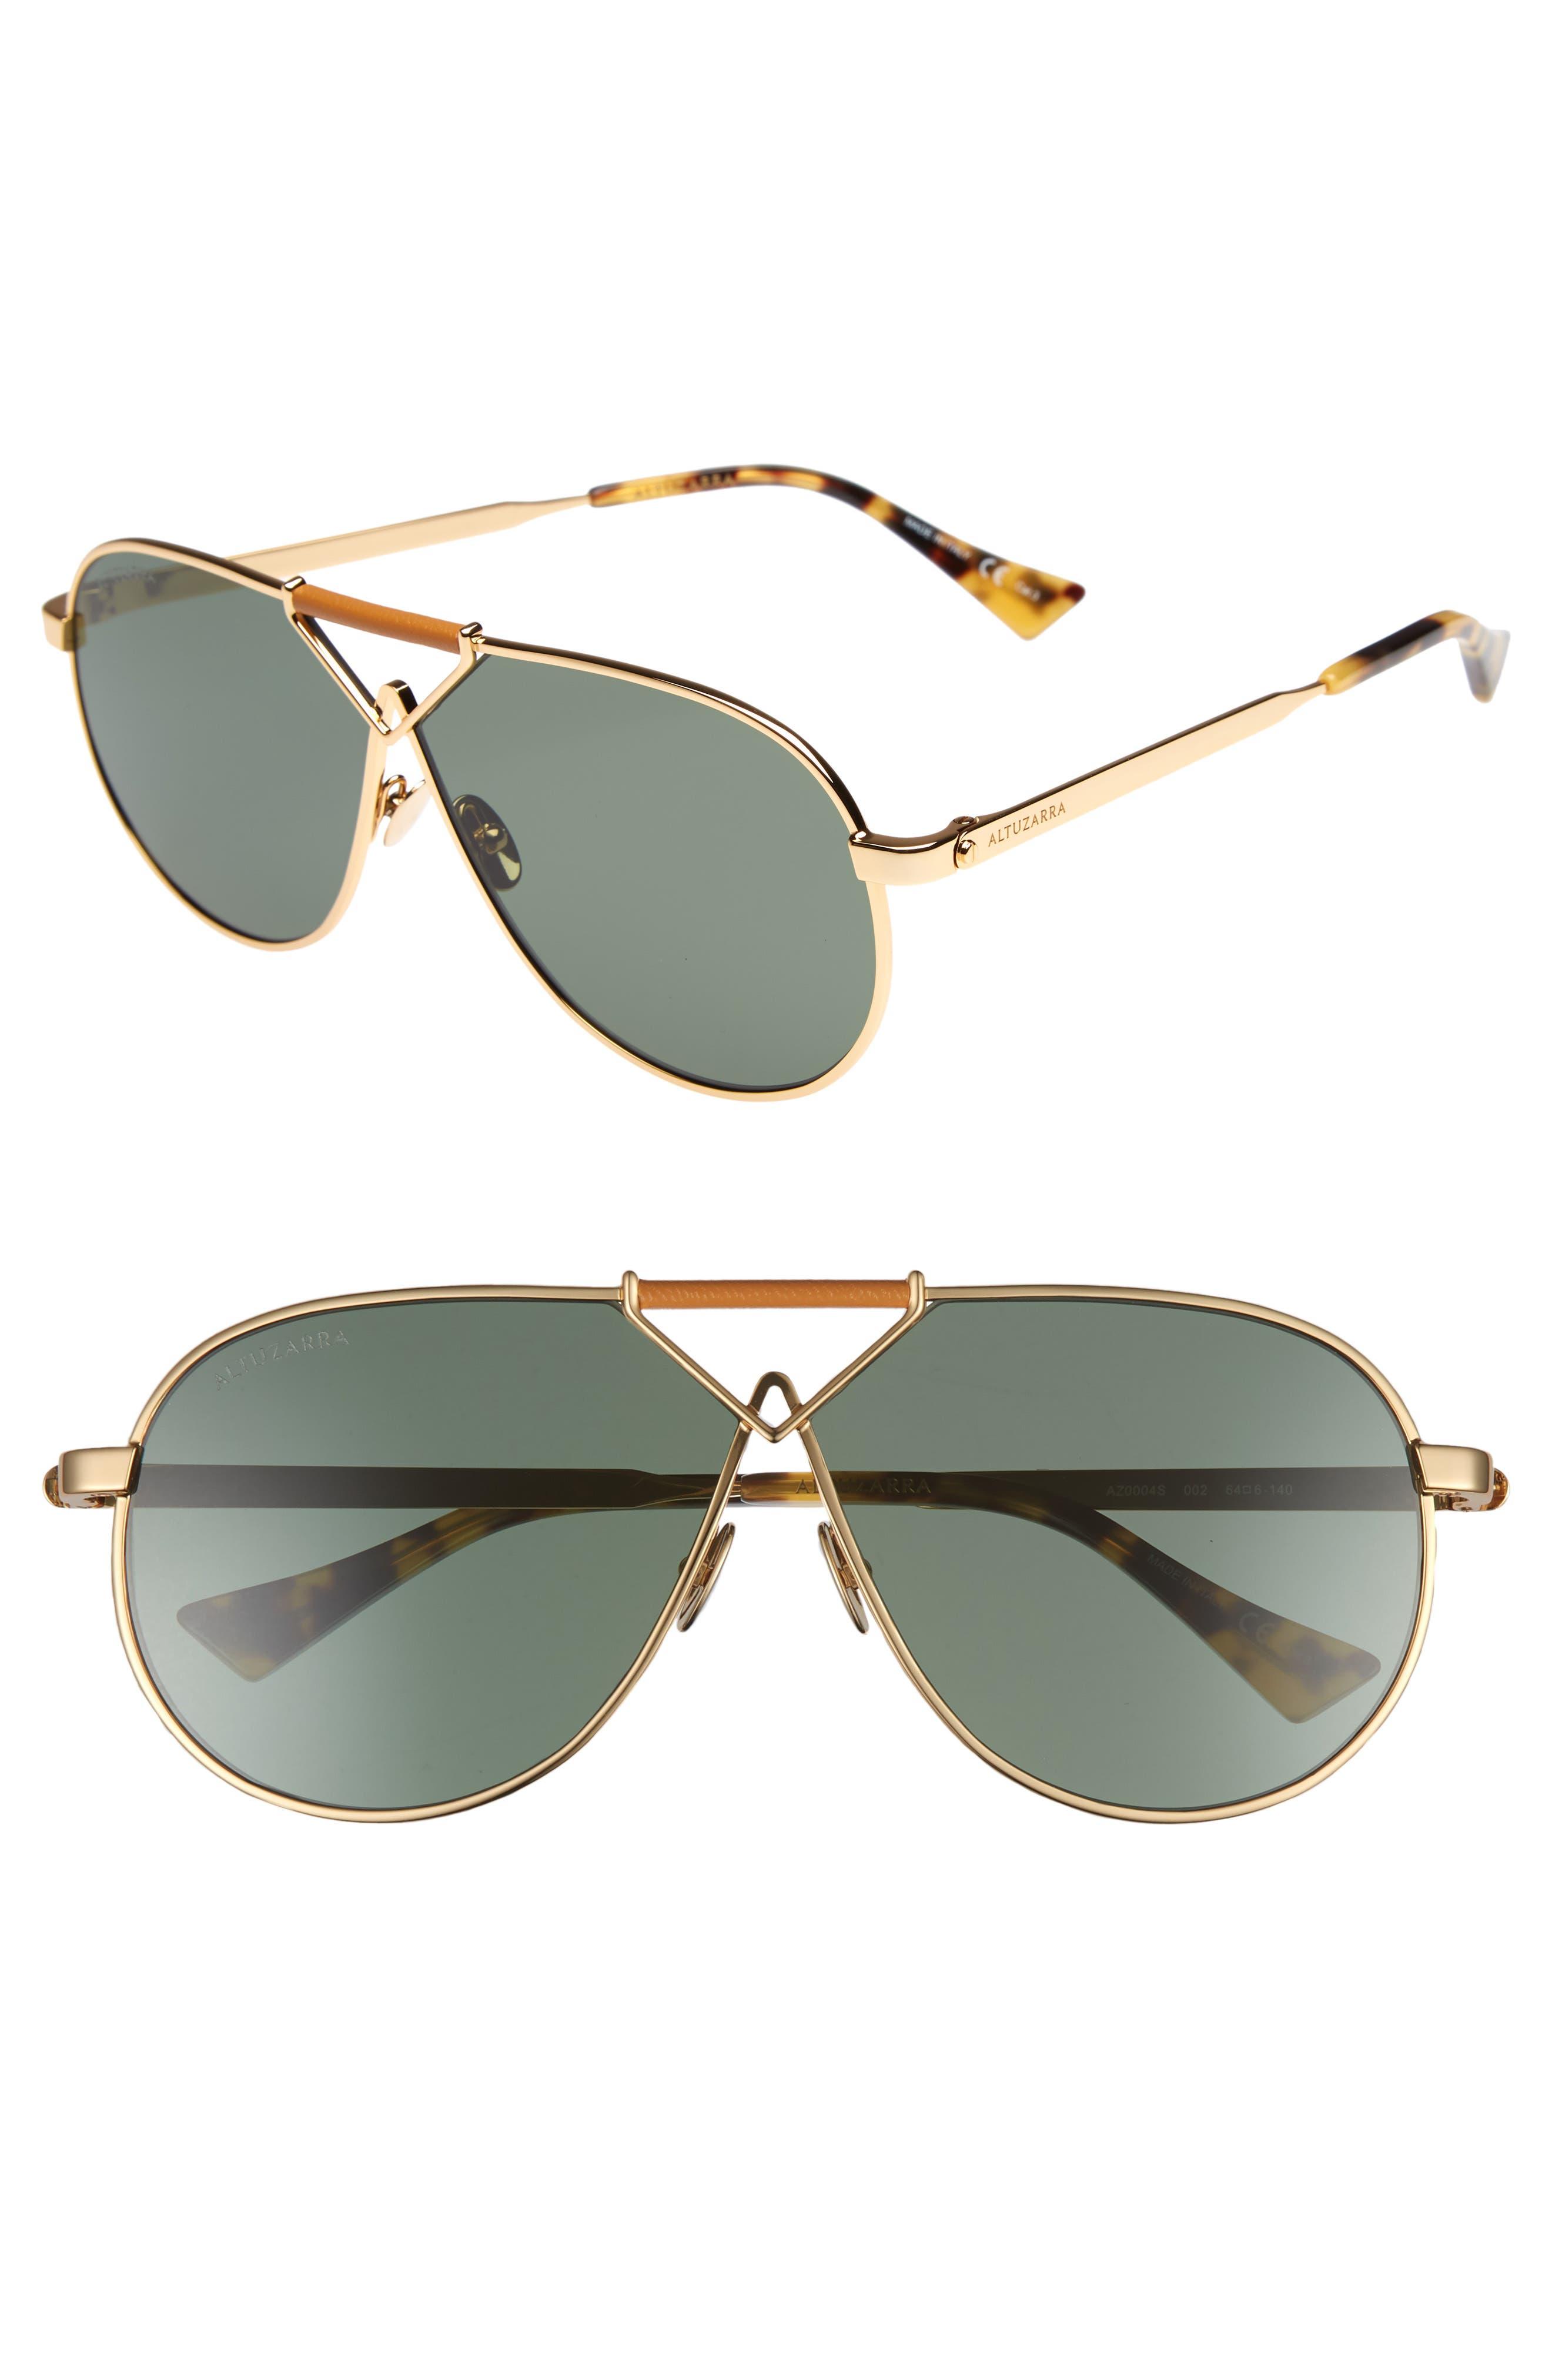 64mm Aviator Sunglasses,                             Main thumbnail 1, color,                             Gold